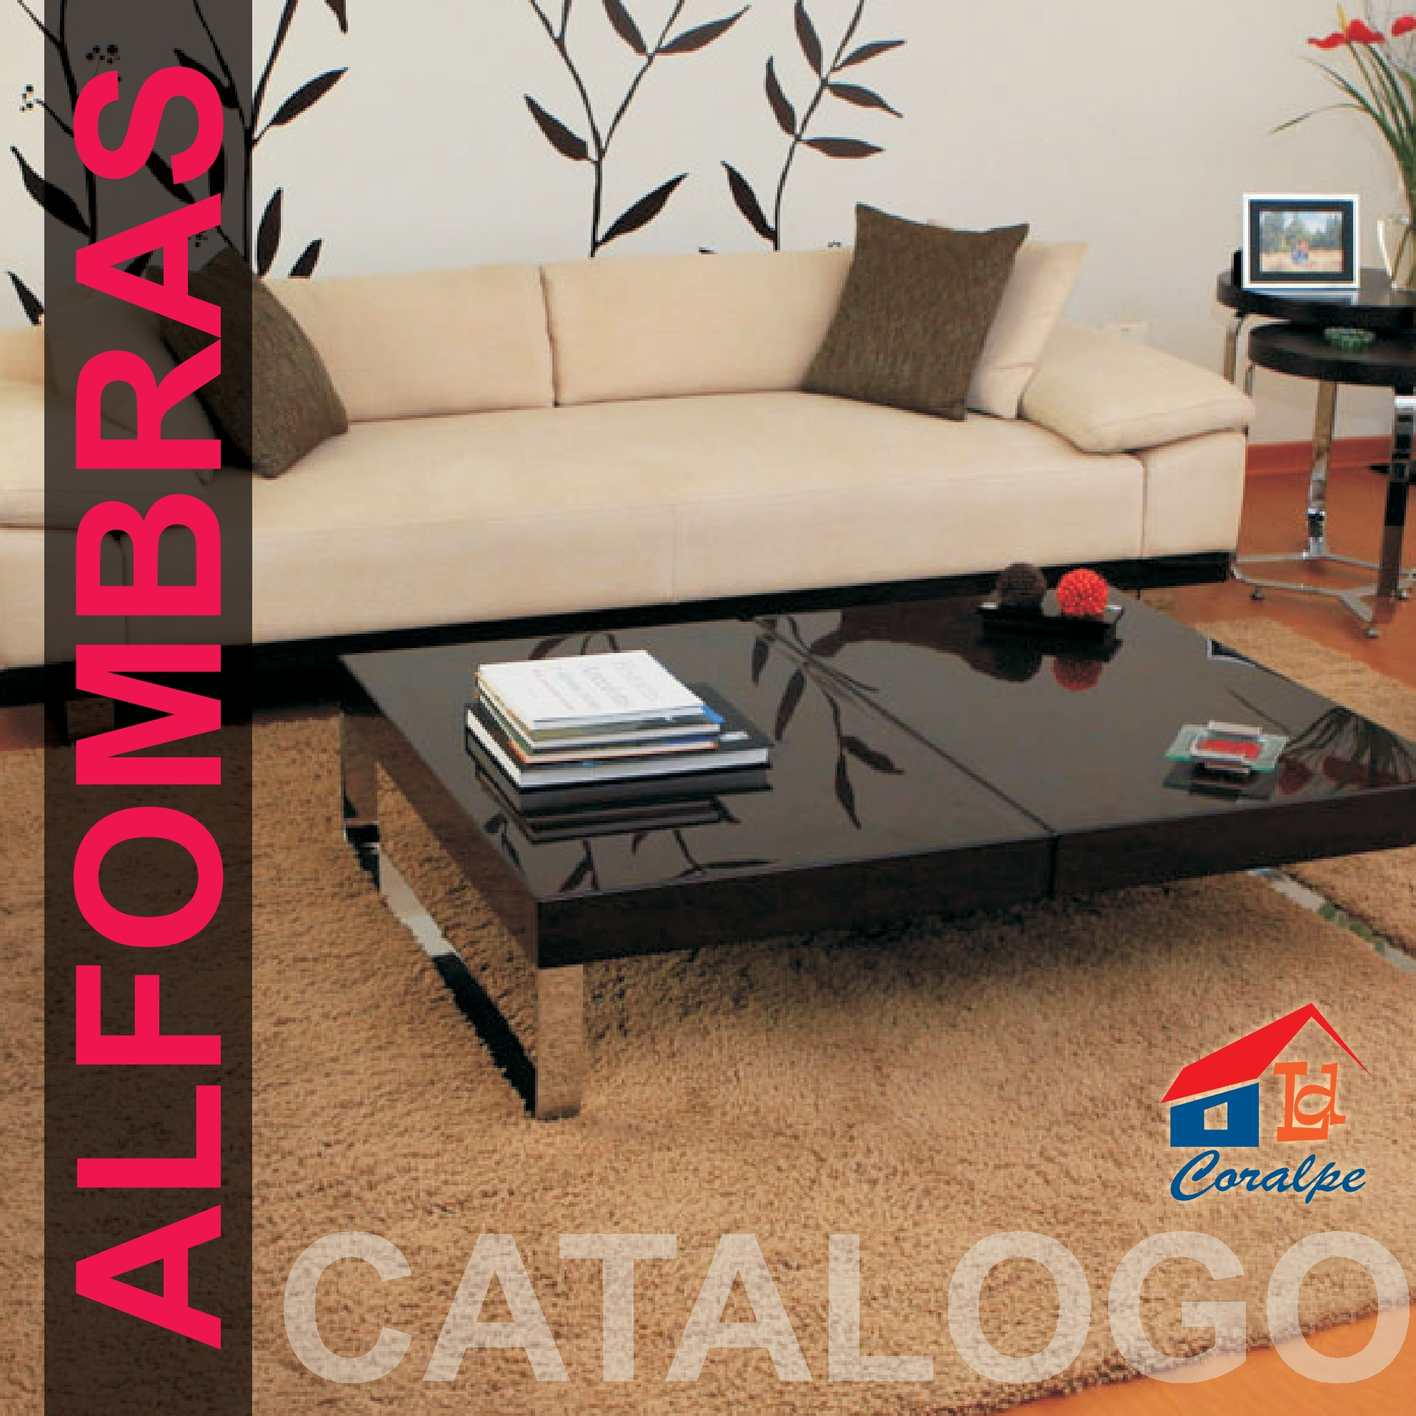 Calam o catalogo de alfombras - Catalogo alfombras ...